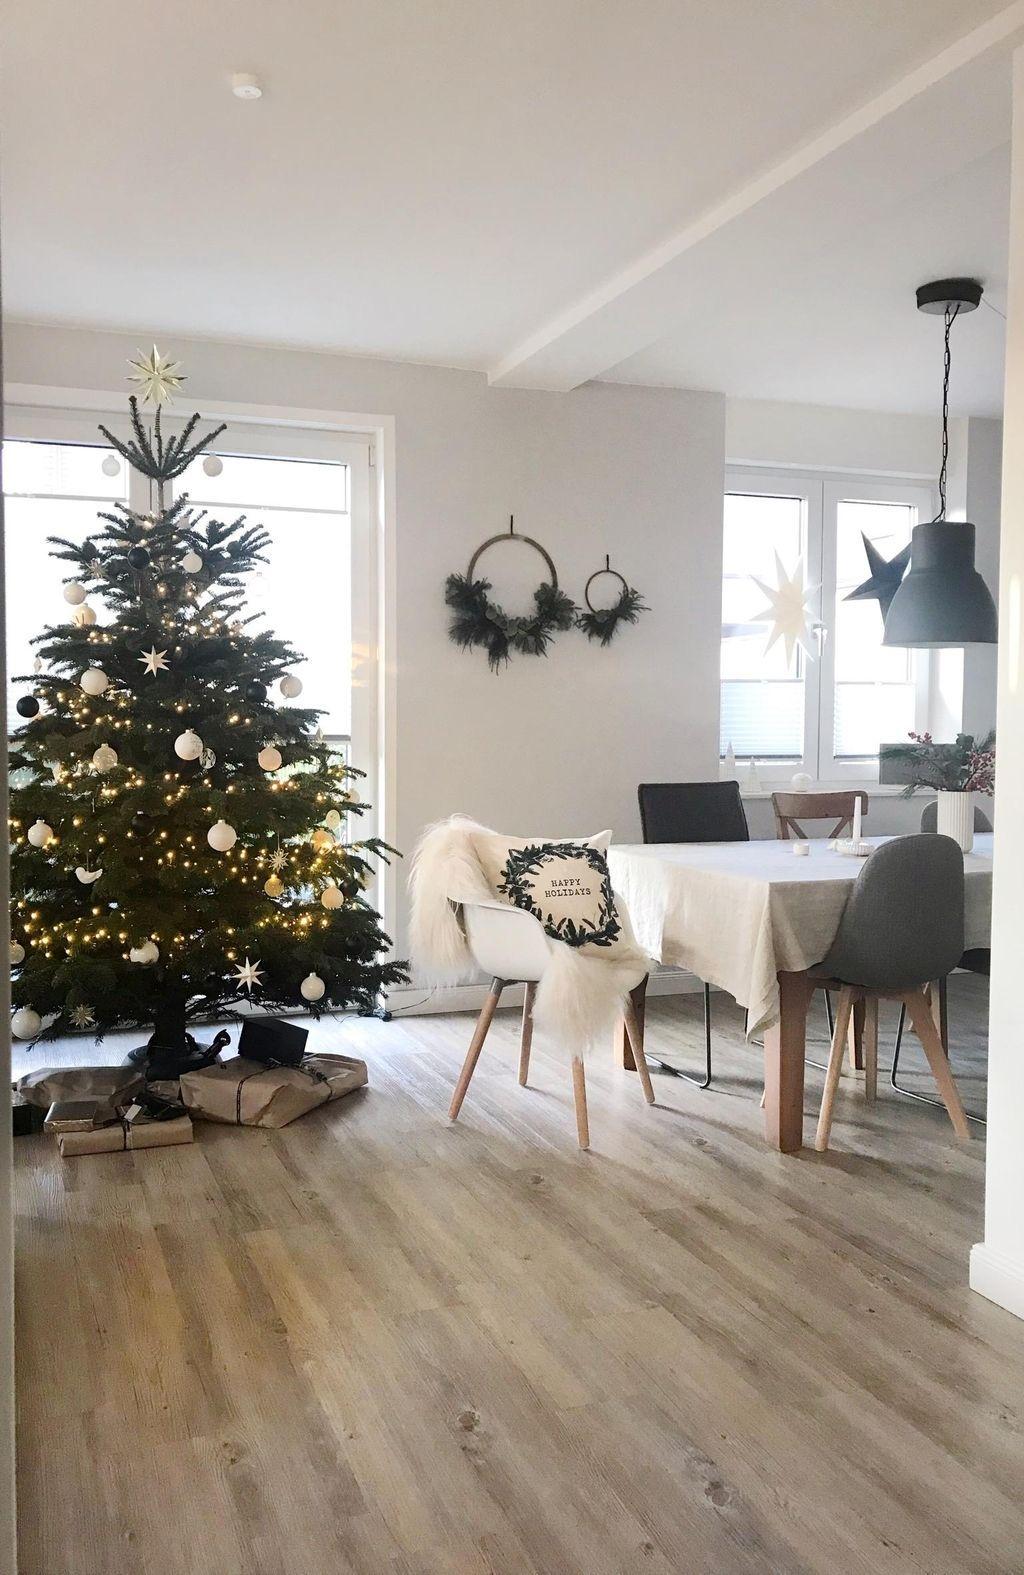 Frau.wohnsache's favorite things- frau.wohnsache's Lieblingsdinge  Christmas 2018 #christmastime #christmastree #christmasishere #cozyhome #allisbright   -#ChristmasDishesdecoration #ChristmasDishesforparty #ChristmasDishesforpotluck #ChristmasDishestowels #ChristmasDishesturkey #ChristmasDishesvegetable #coldChristmasDishes #potterybarnChristmasDishes